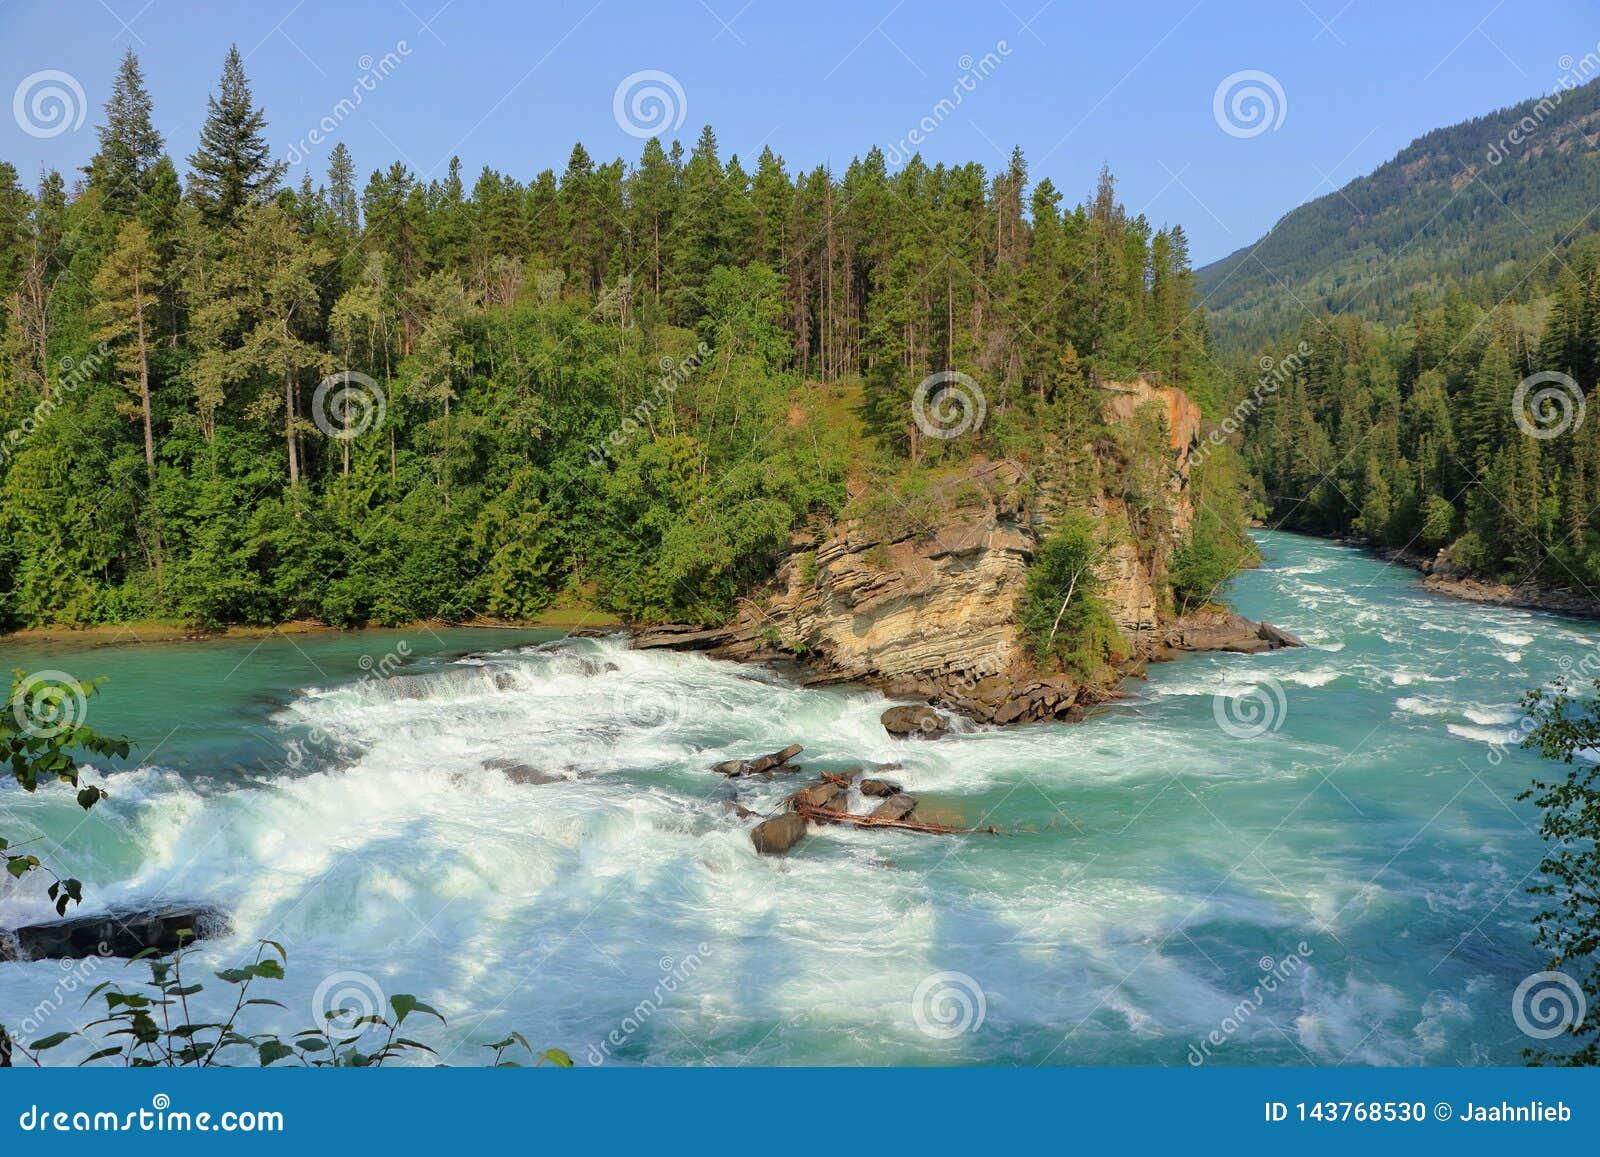 Fraser River die over Achterhoededalingen meeslepen, zet Robson Provincial Park, Brits Colombia op